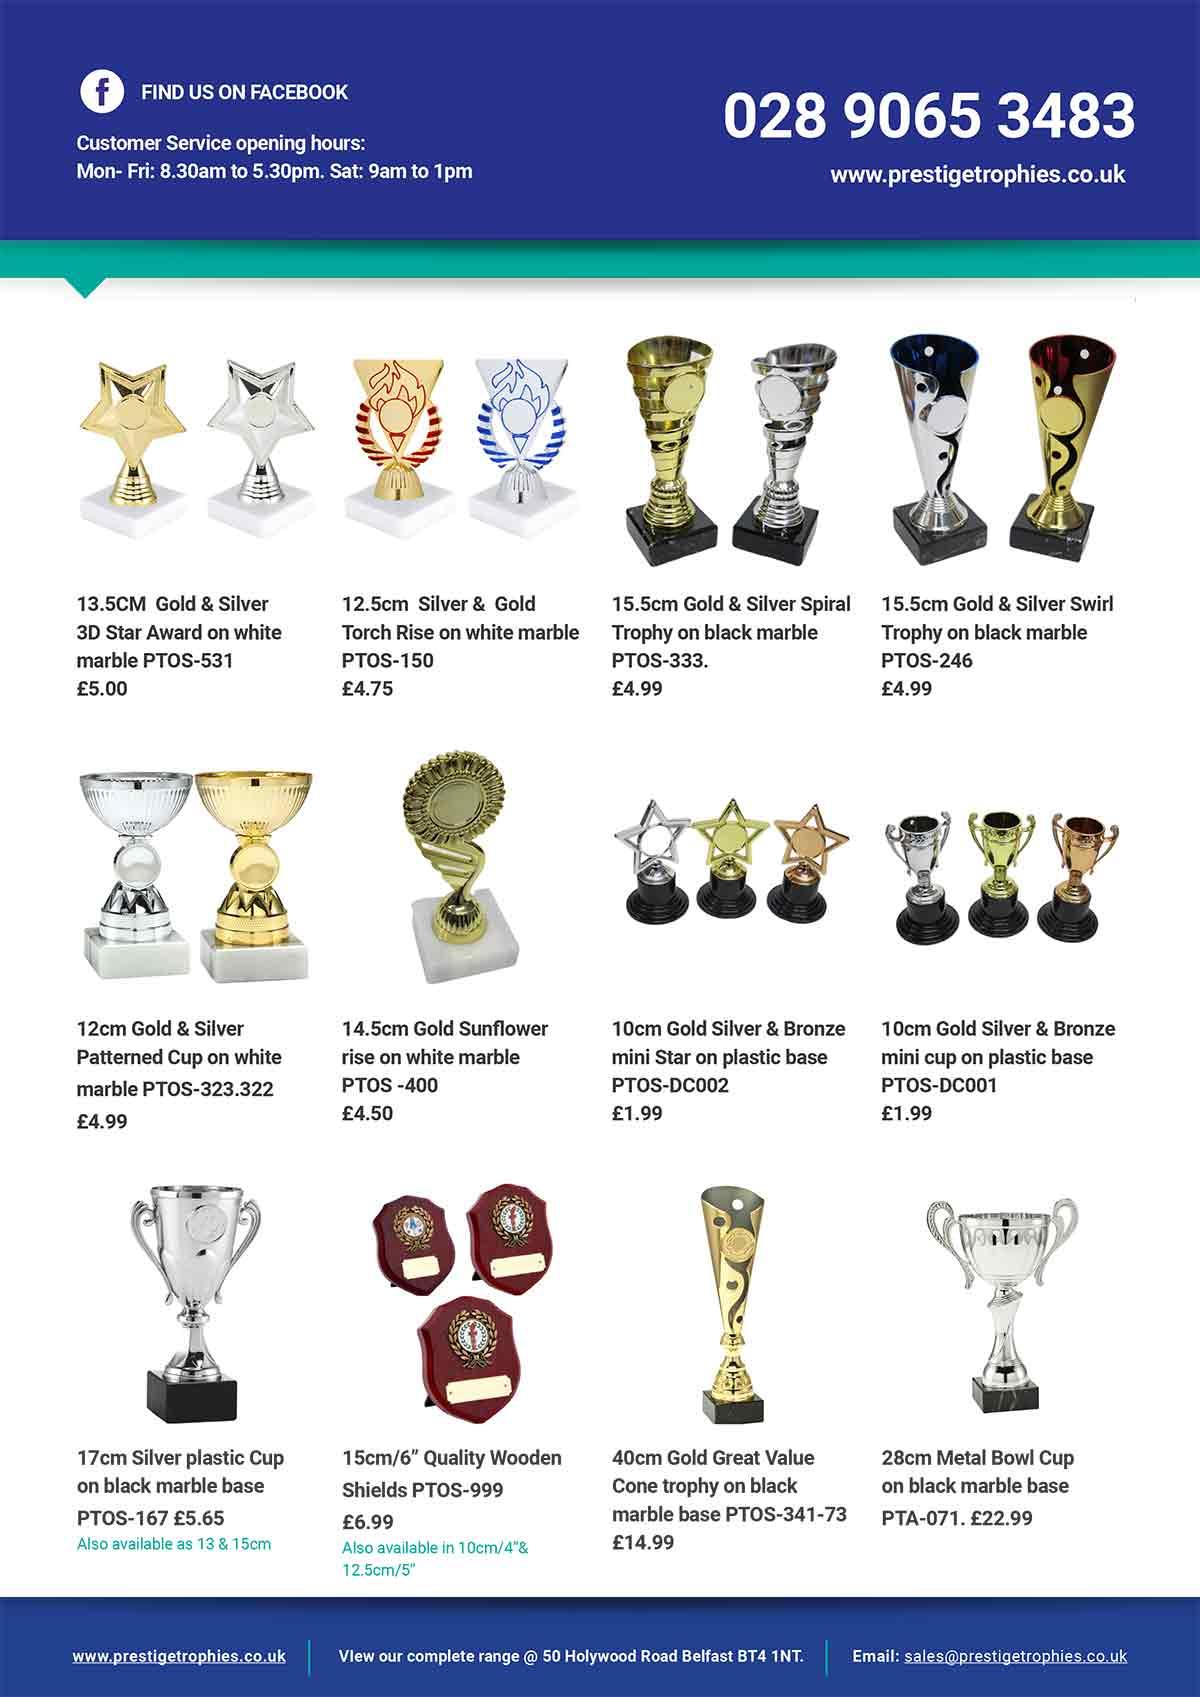 Prestige-Trophies-2020-Exceptional-Value-Range_single_pages-2